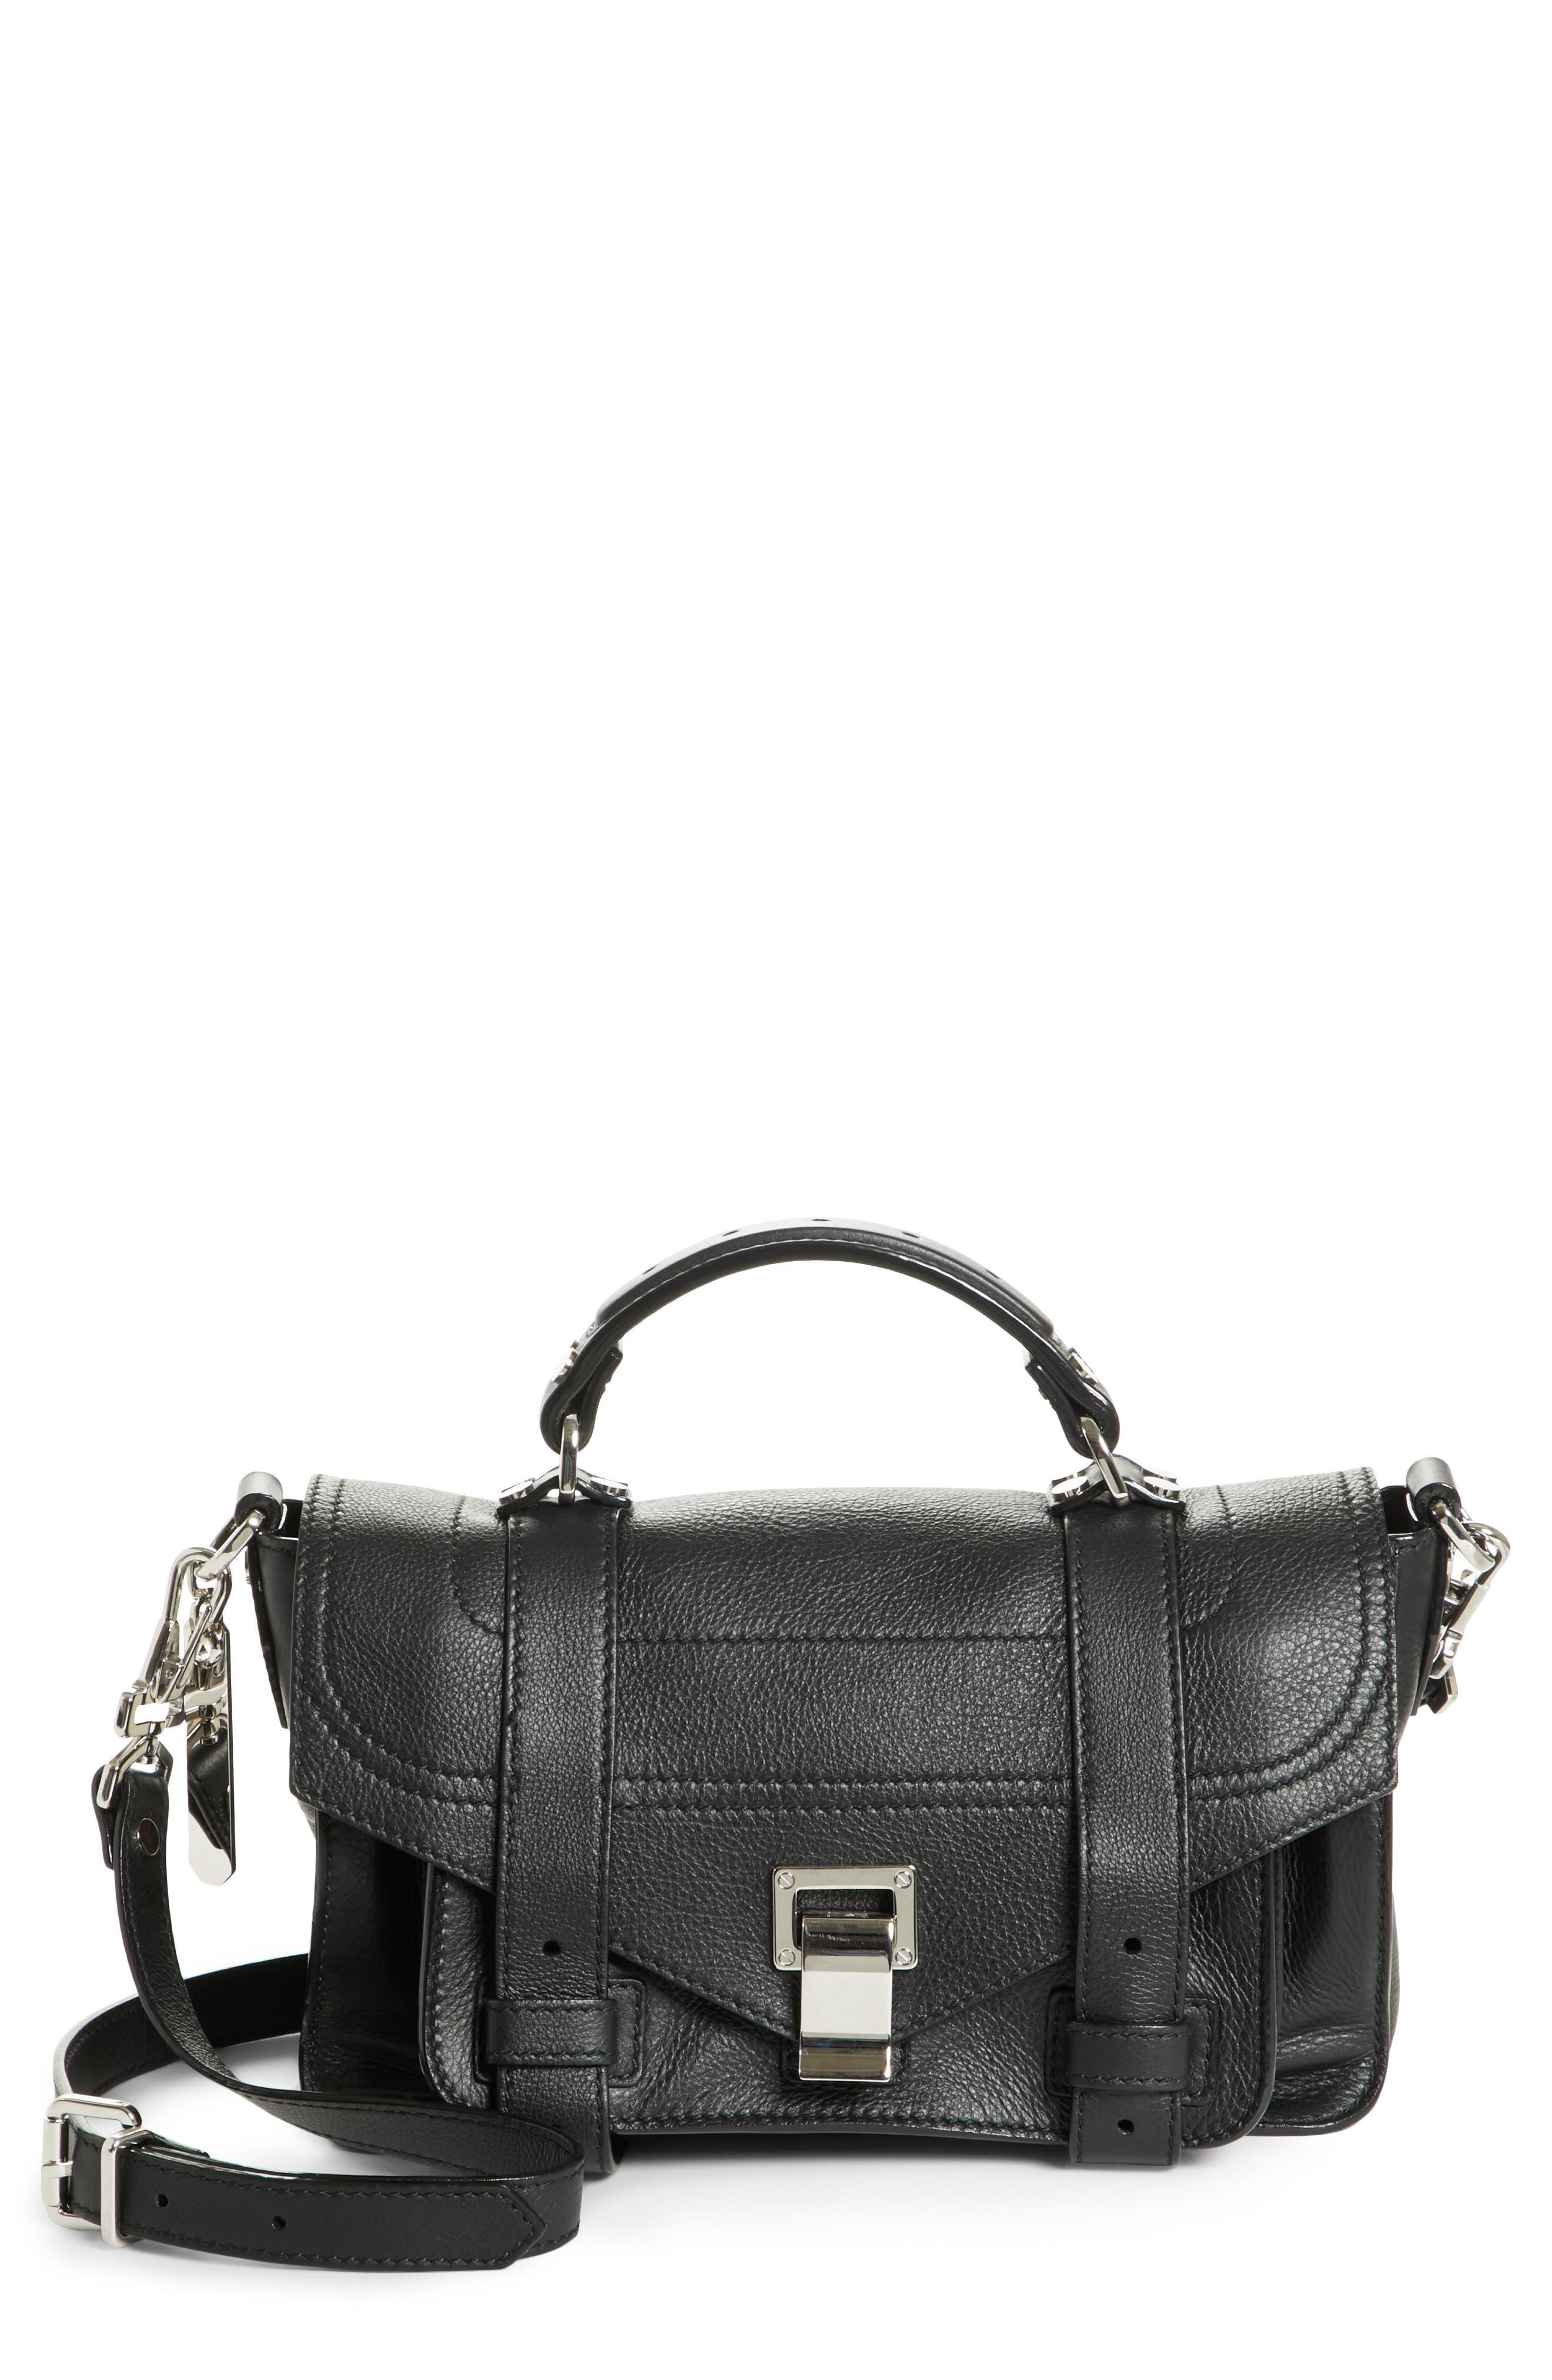 Tiny PS1 Grainy Leather Satchel,                             Main thumbnail 1, color,                             BLACK